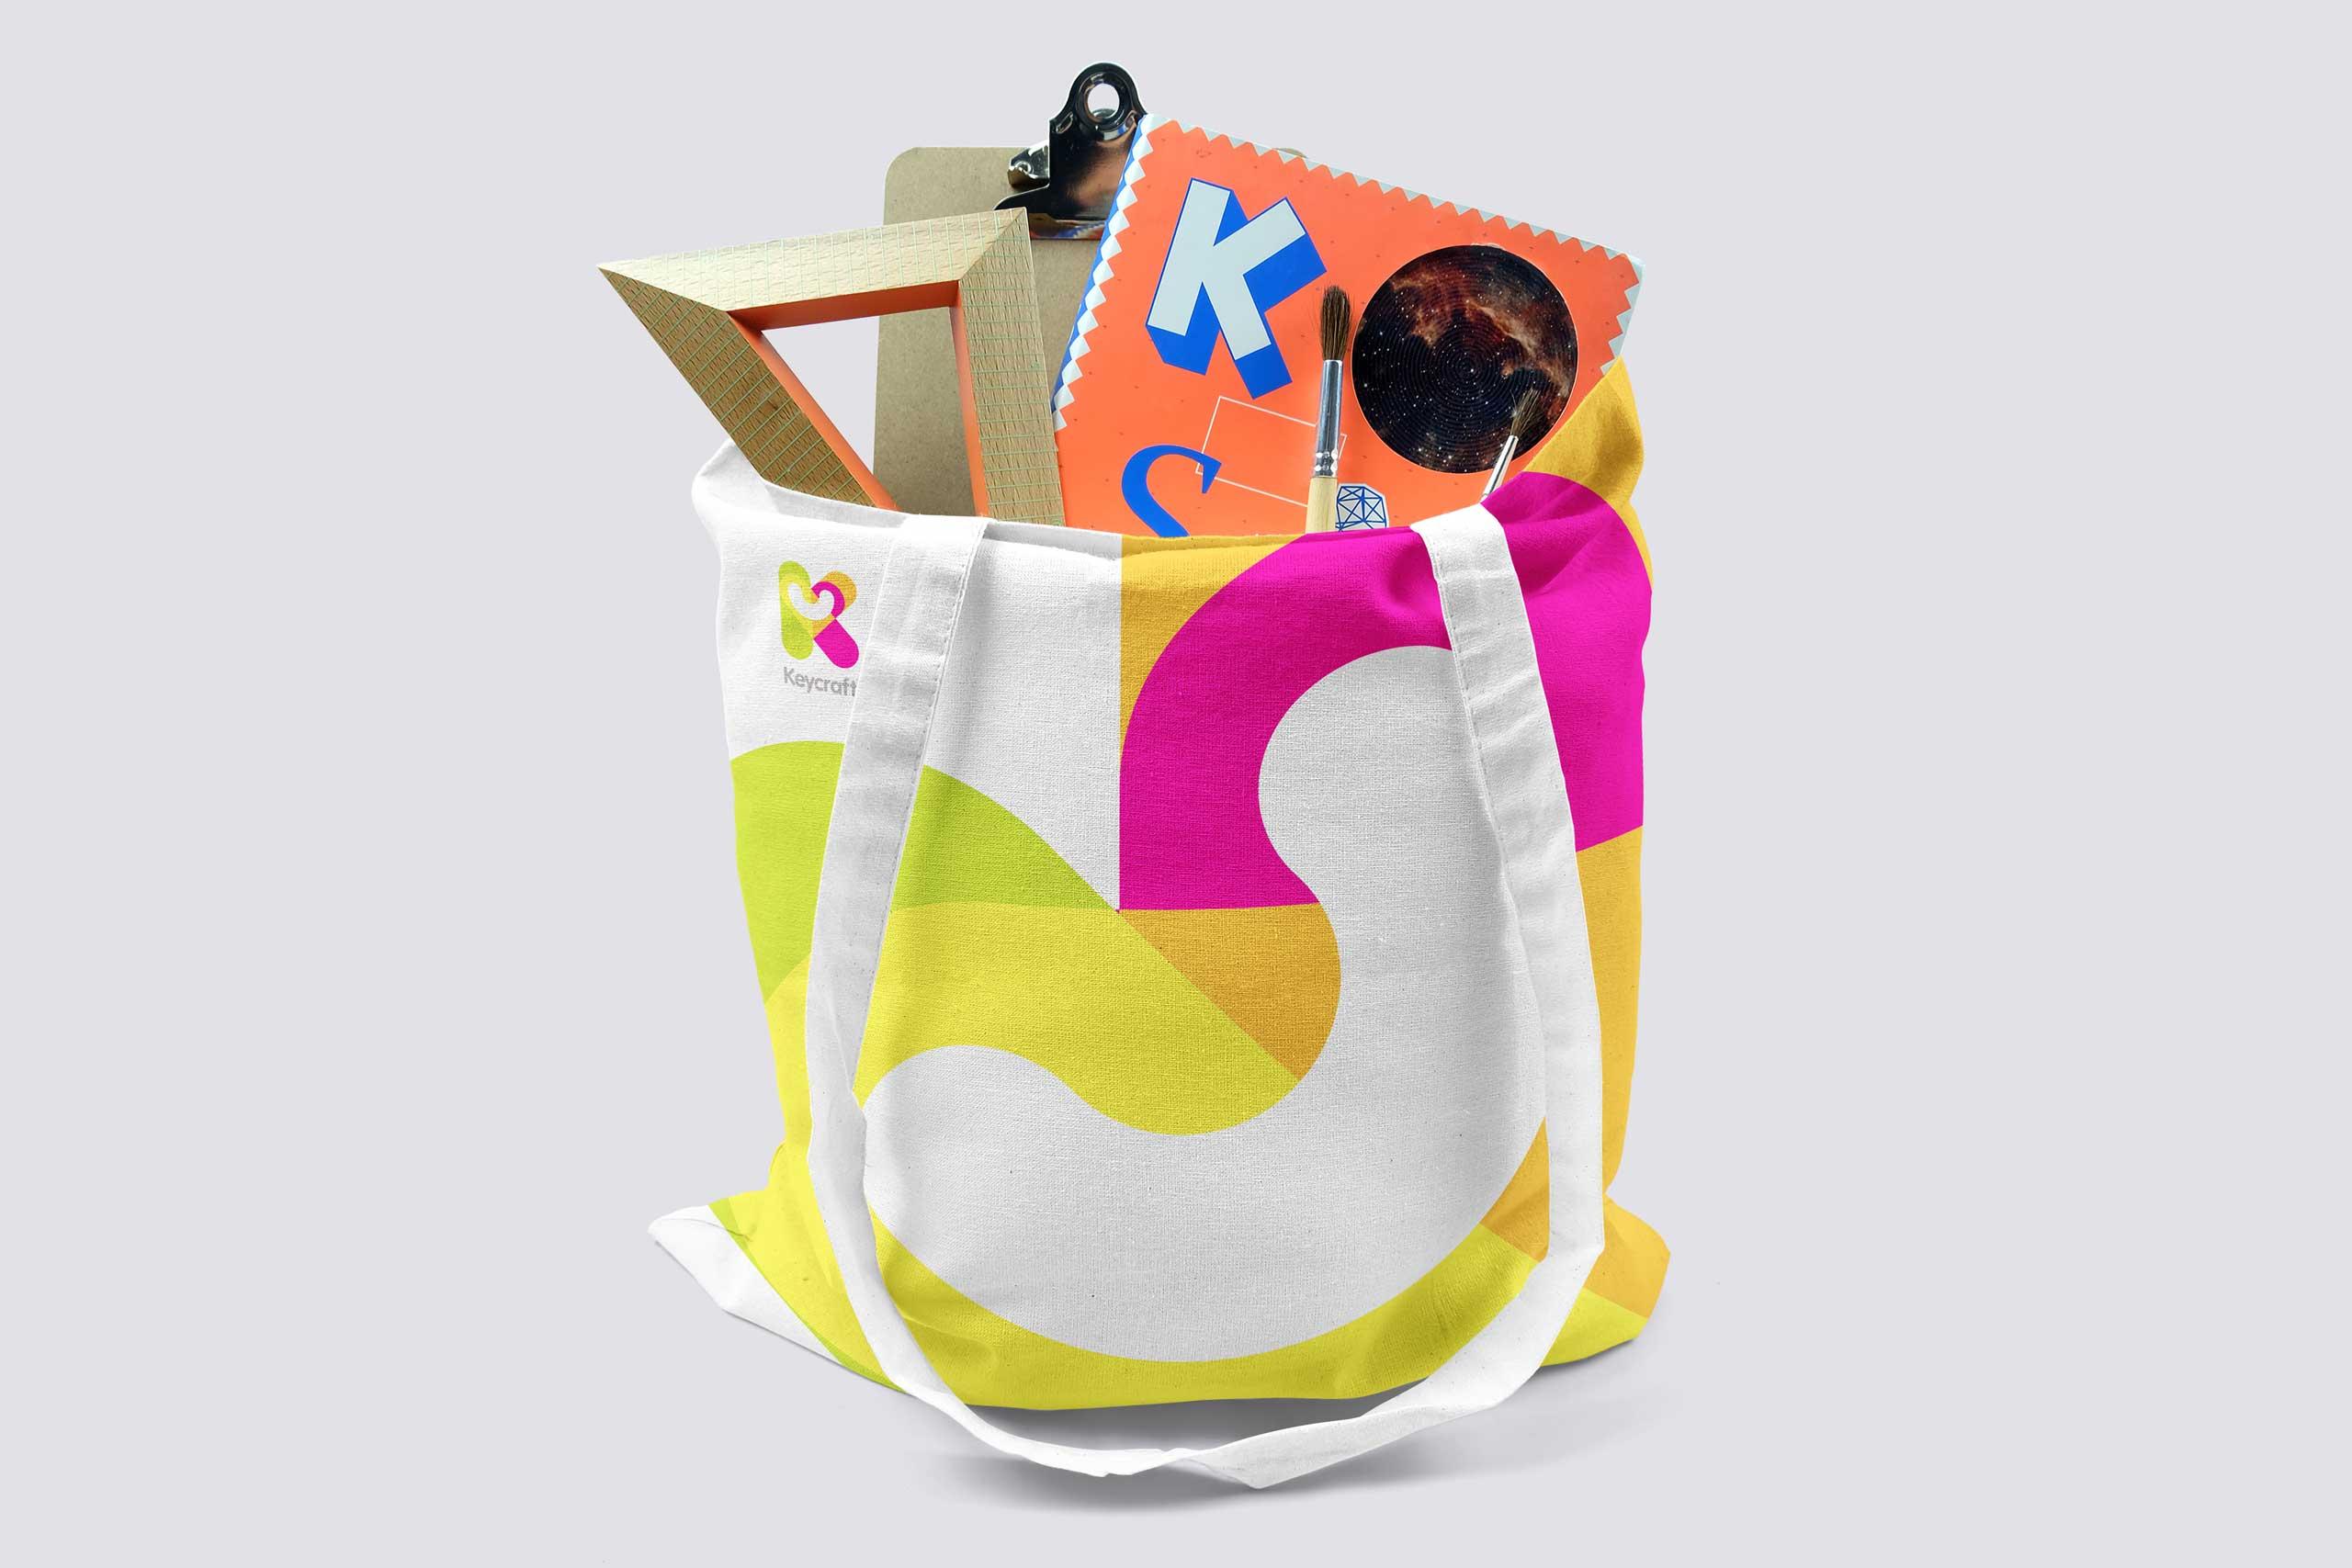 tote bag for keycraft toys branding